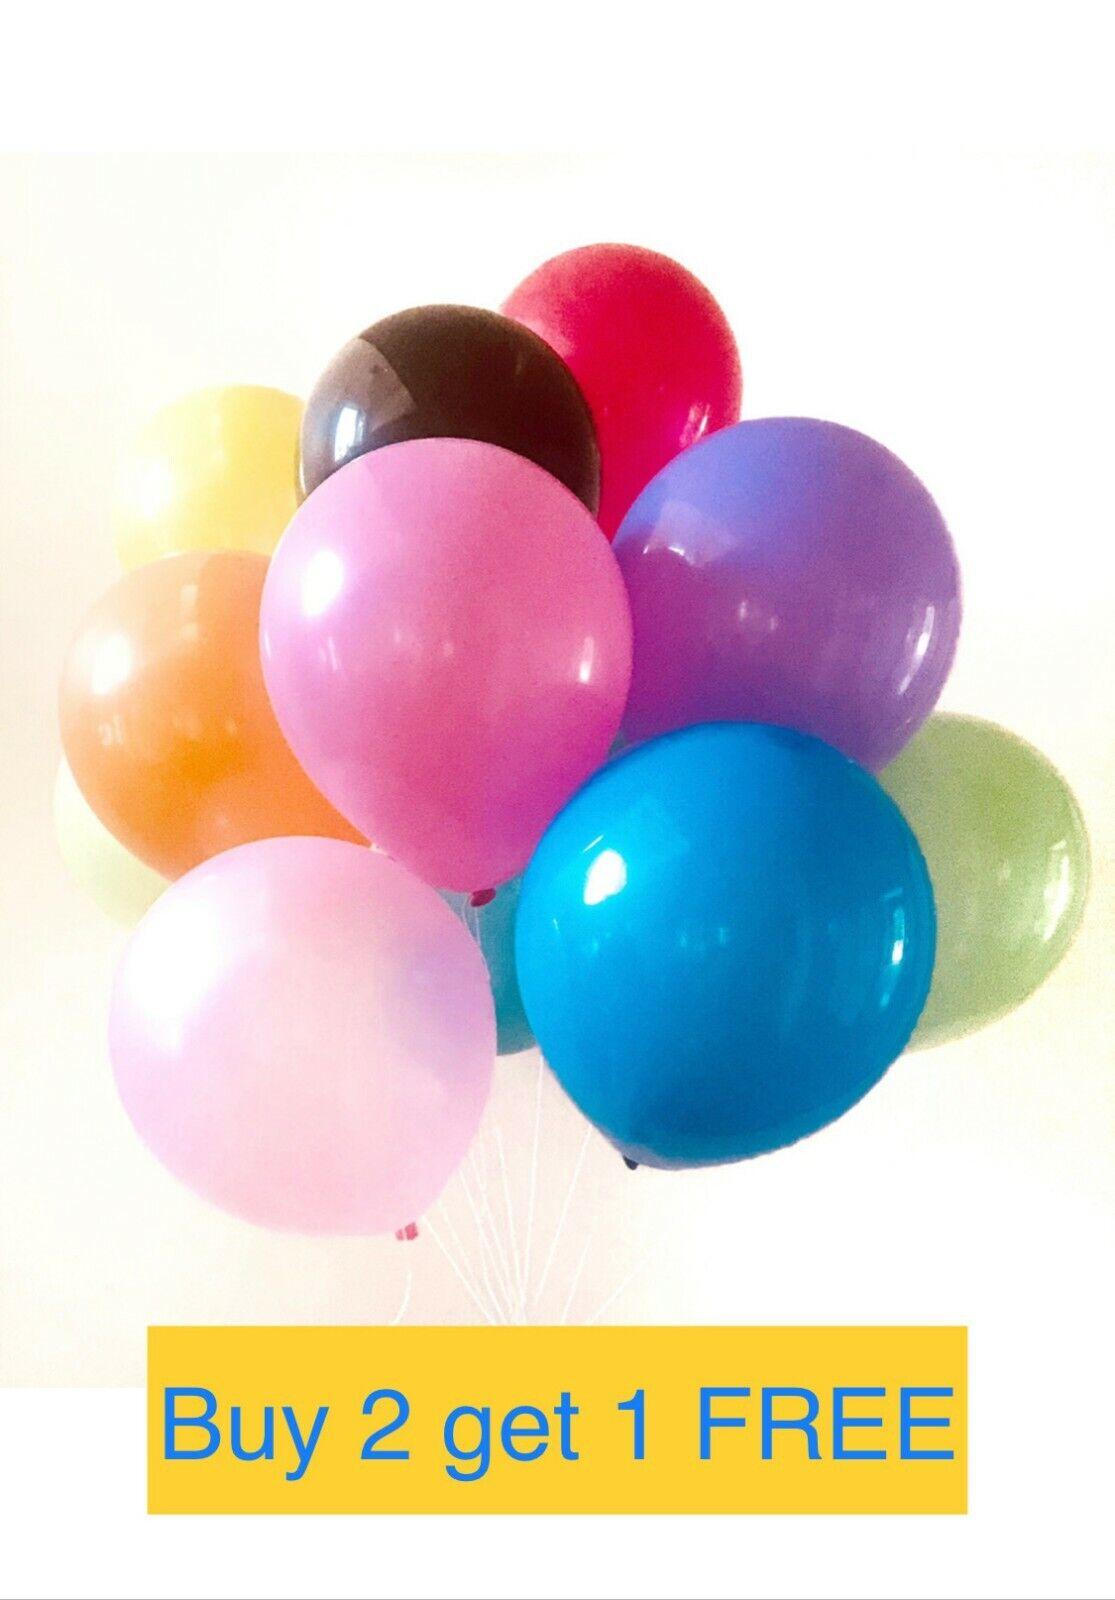 10Inch Plain Latex Balloons Blue White Helium Quality Party Birthday Wedding DIY